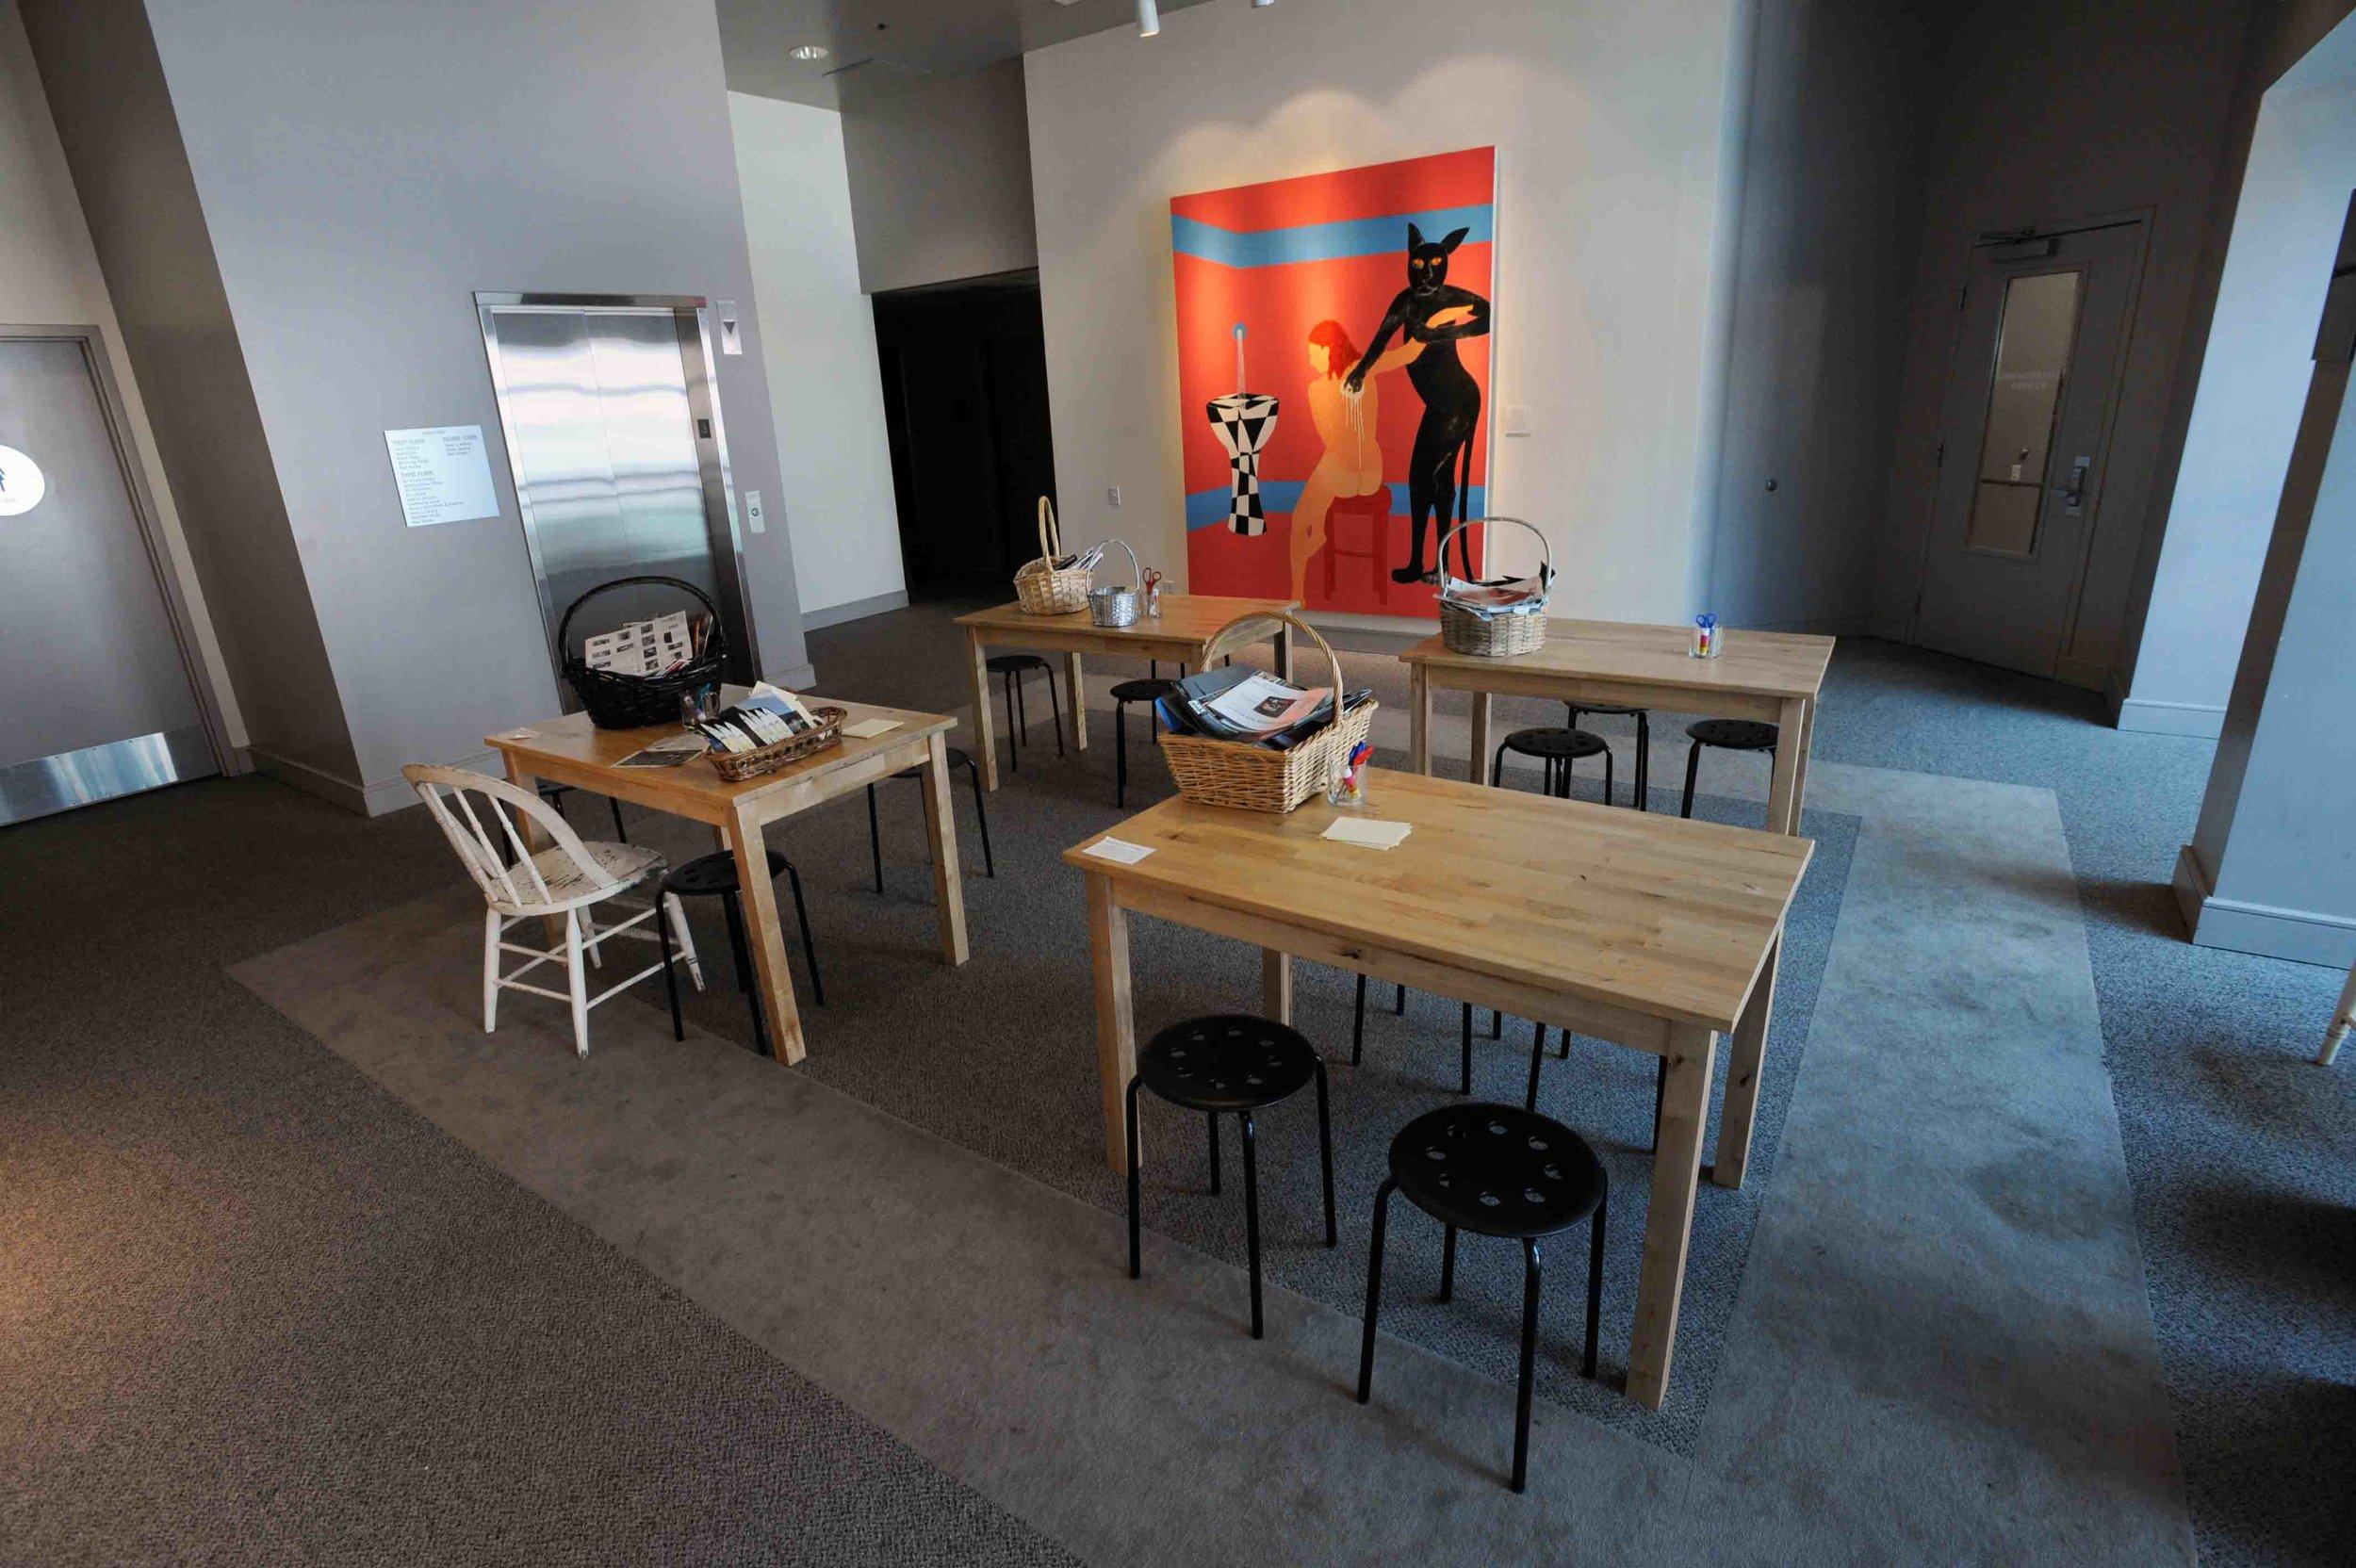 Santa Cruz Museum of Art & History All You Need Is Love (Art Forum Gallery, 3rd floor) March 31, 2012 – July 29, 2012 2.jpg